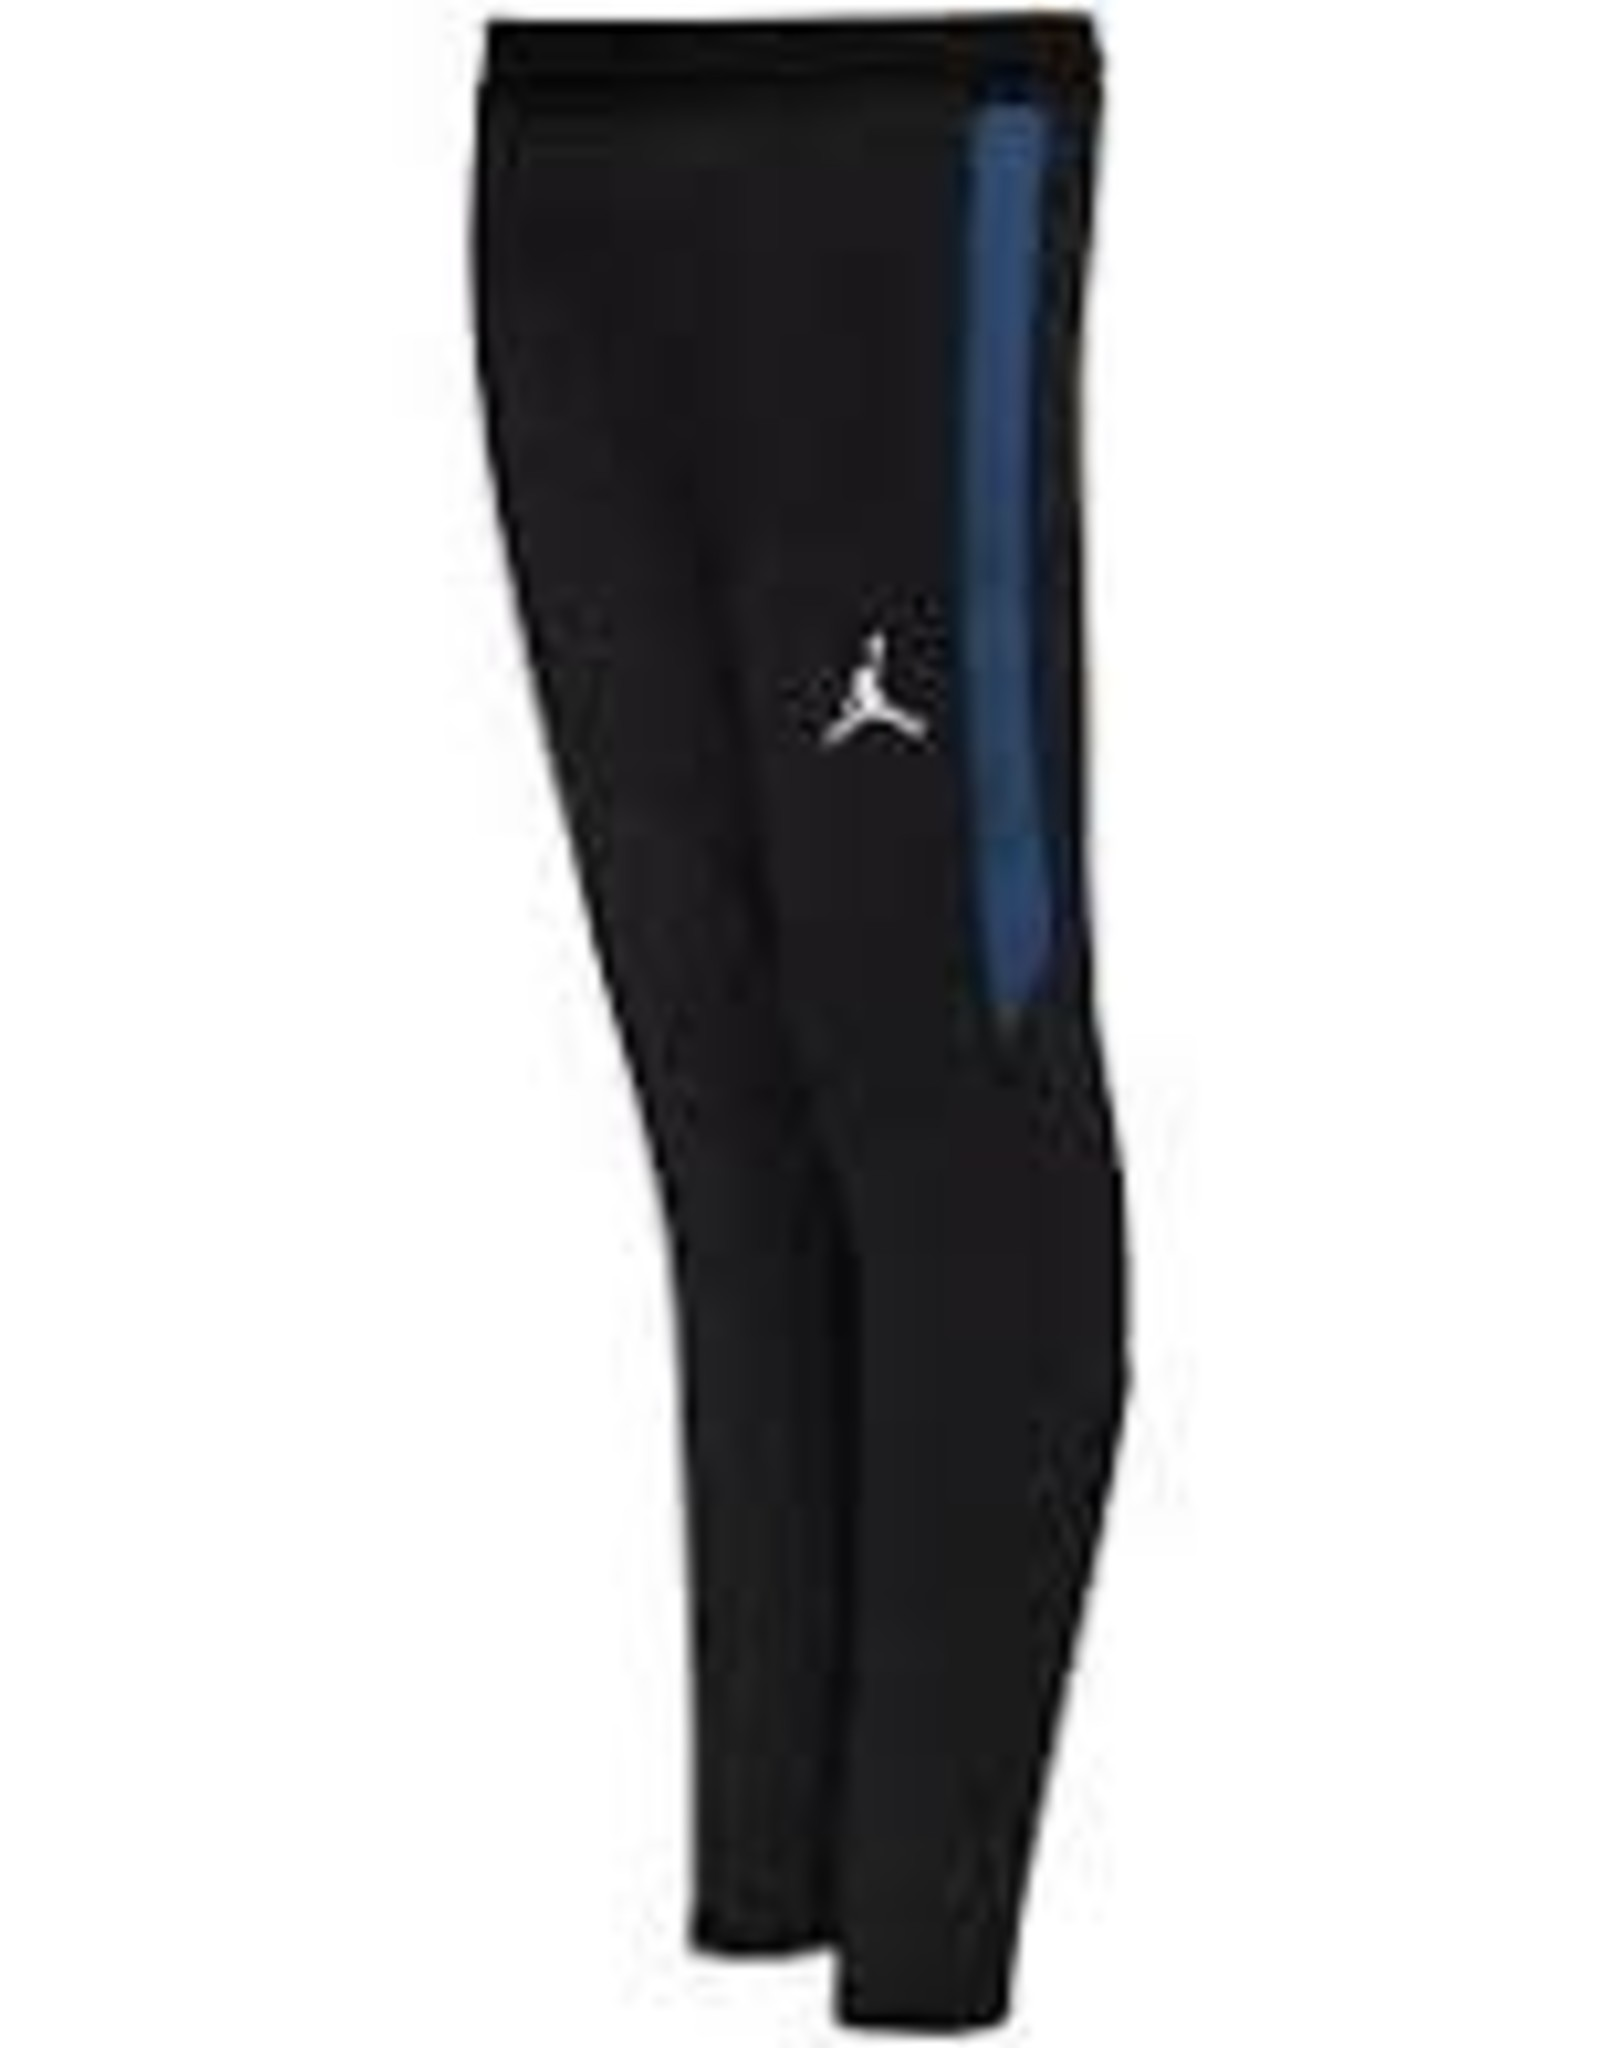 Nike PSG broek zwart/blauw